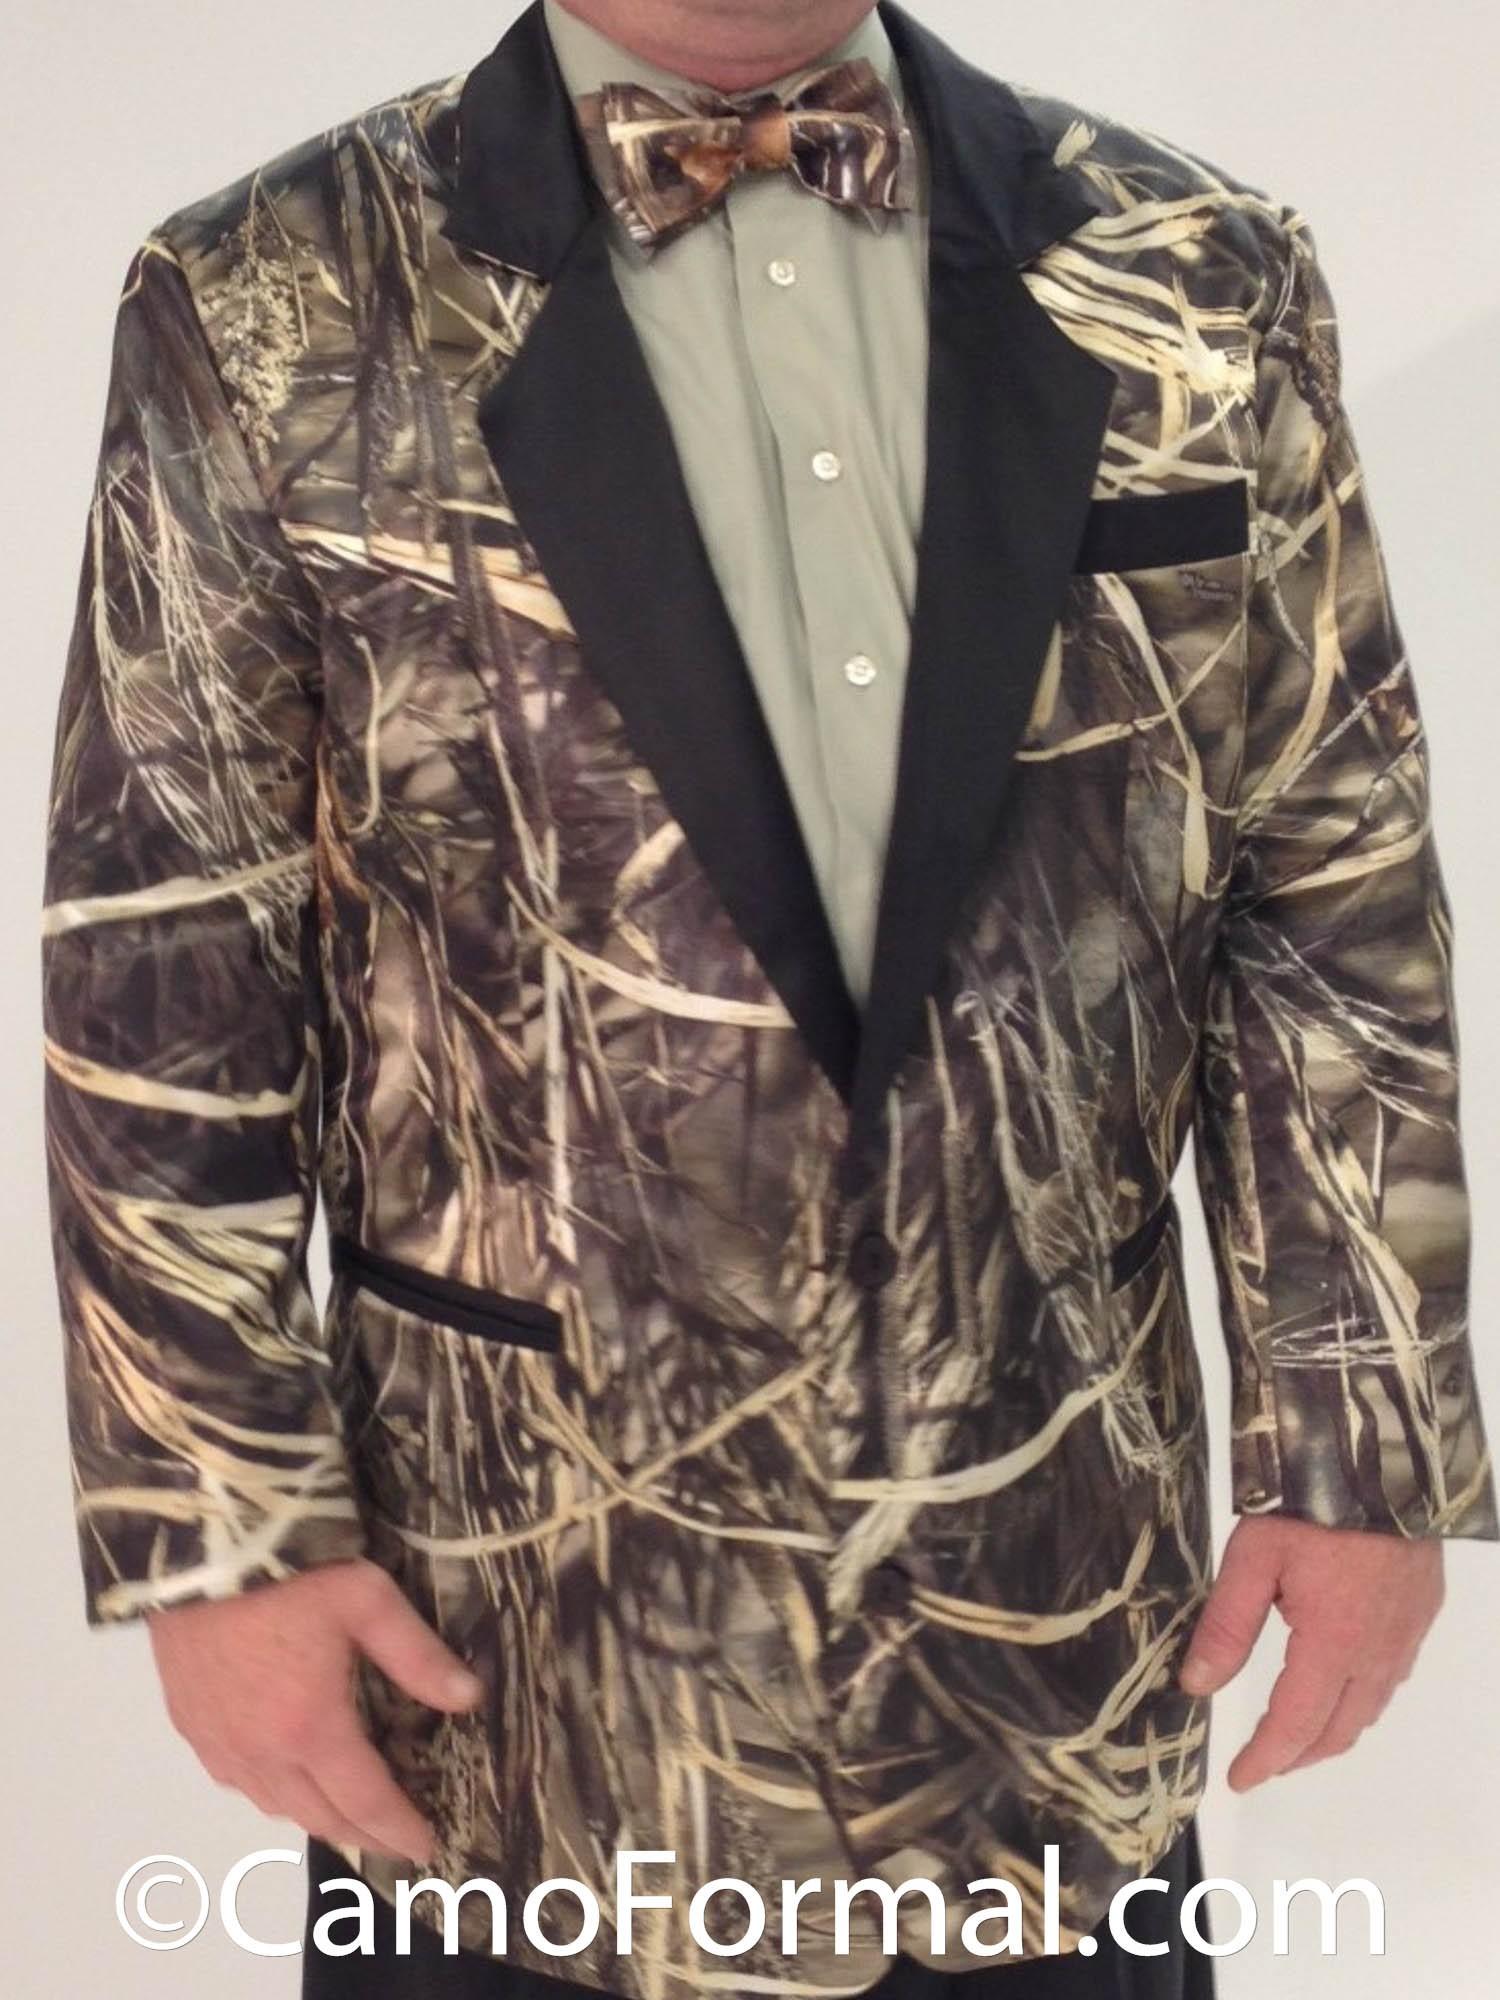 Camo Tuxedo Blazer Jacket Camouflage Prom Wedding Homecoming Formals